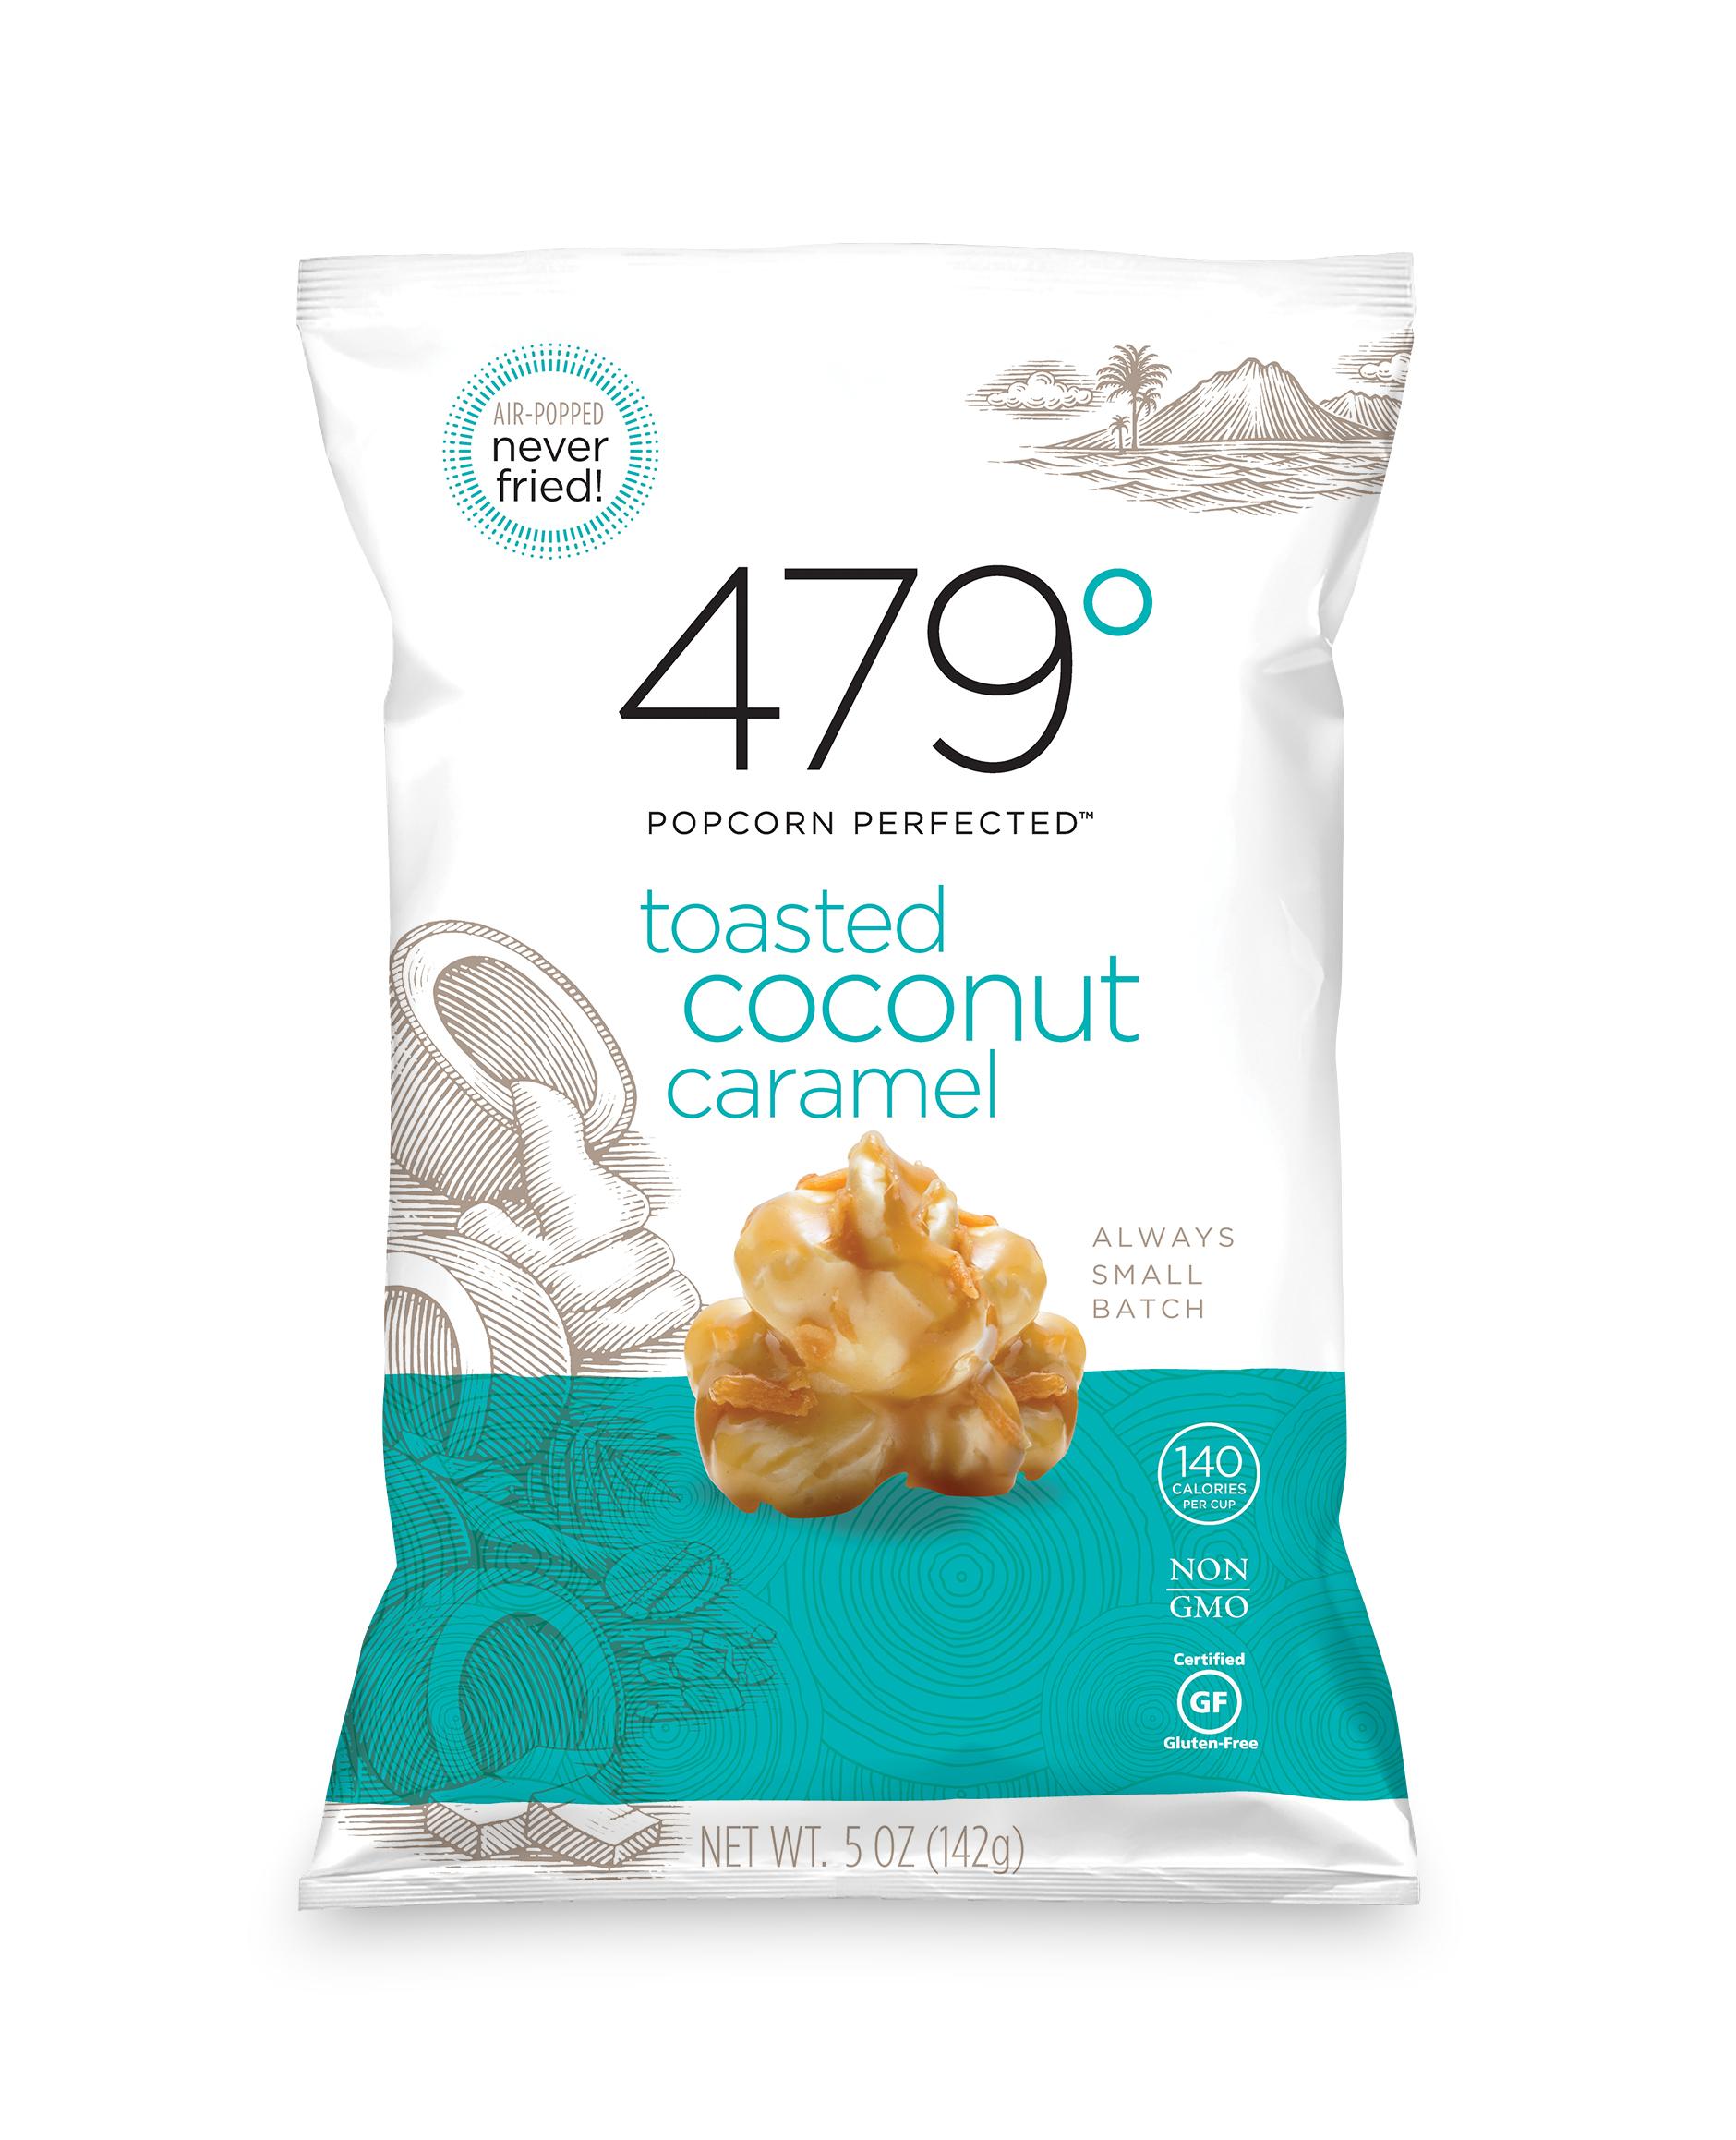 5oz toasted coconut caramel